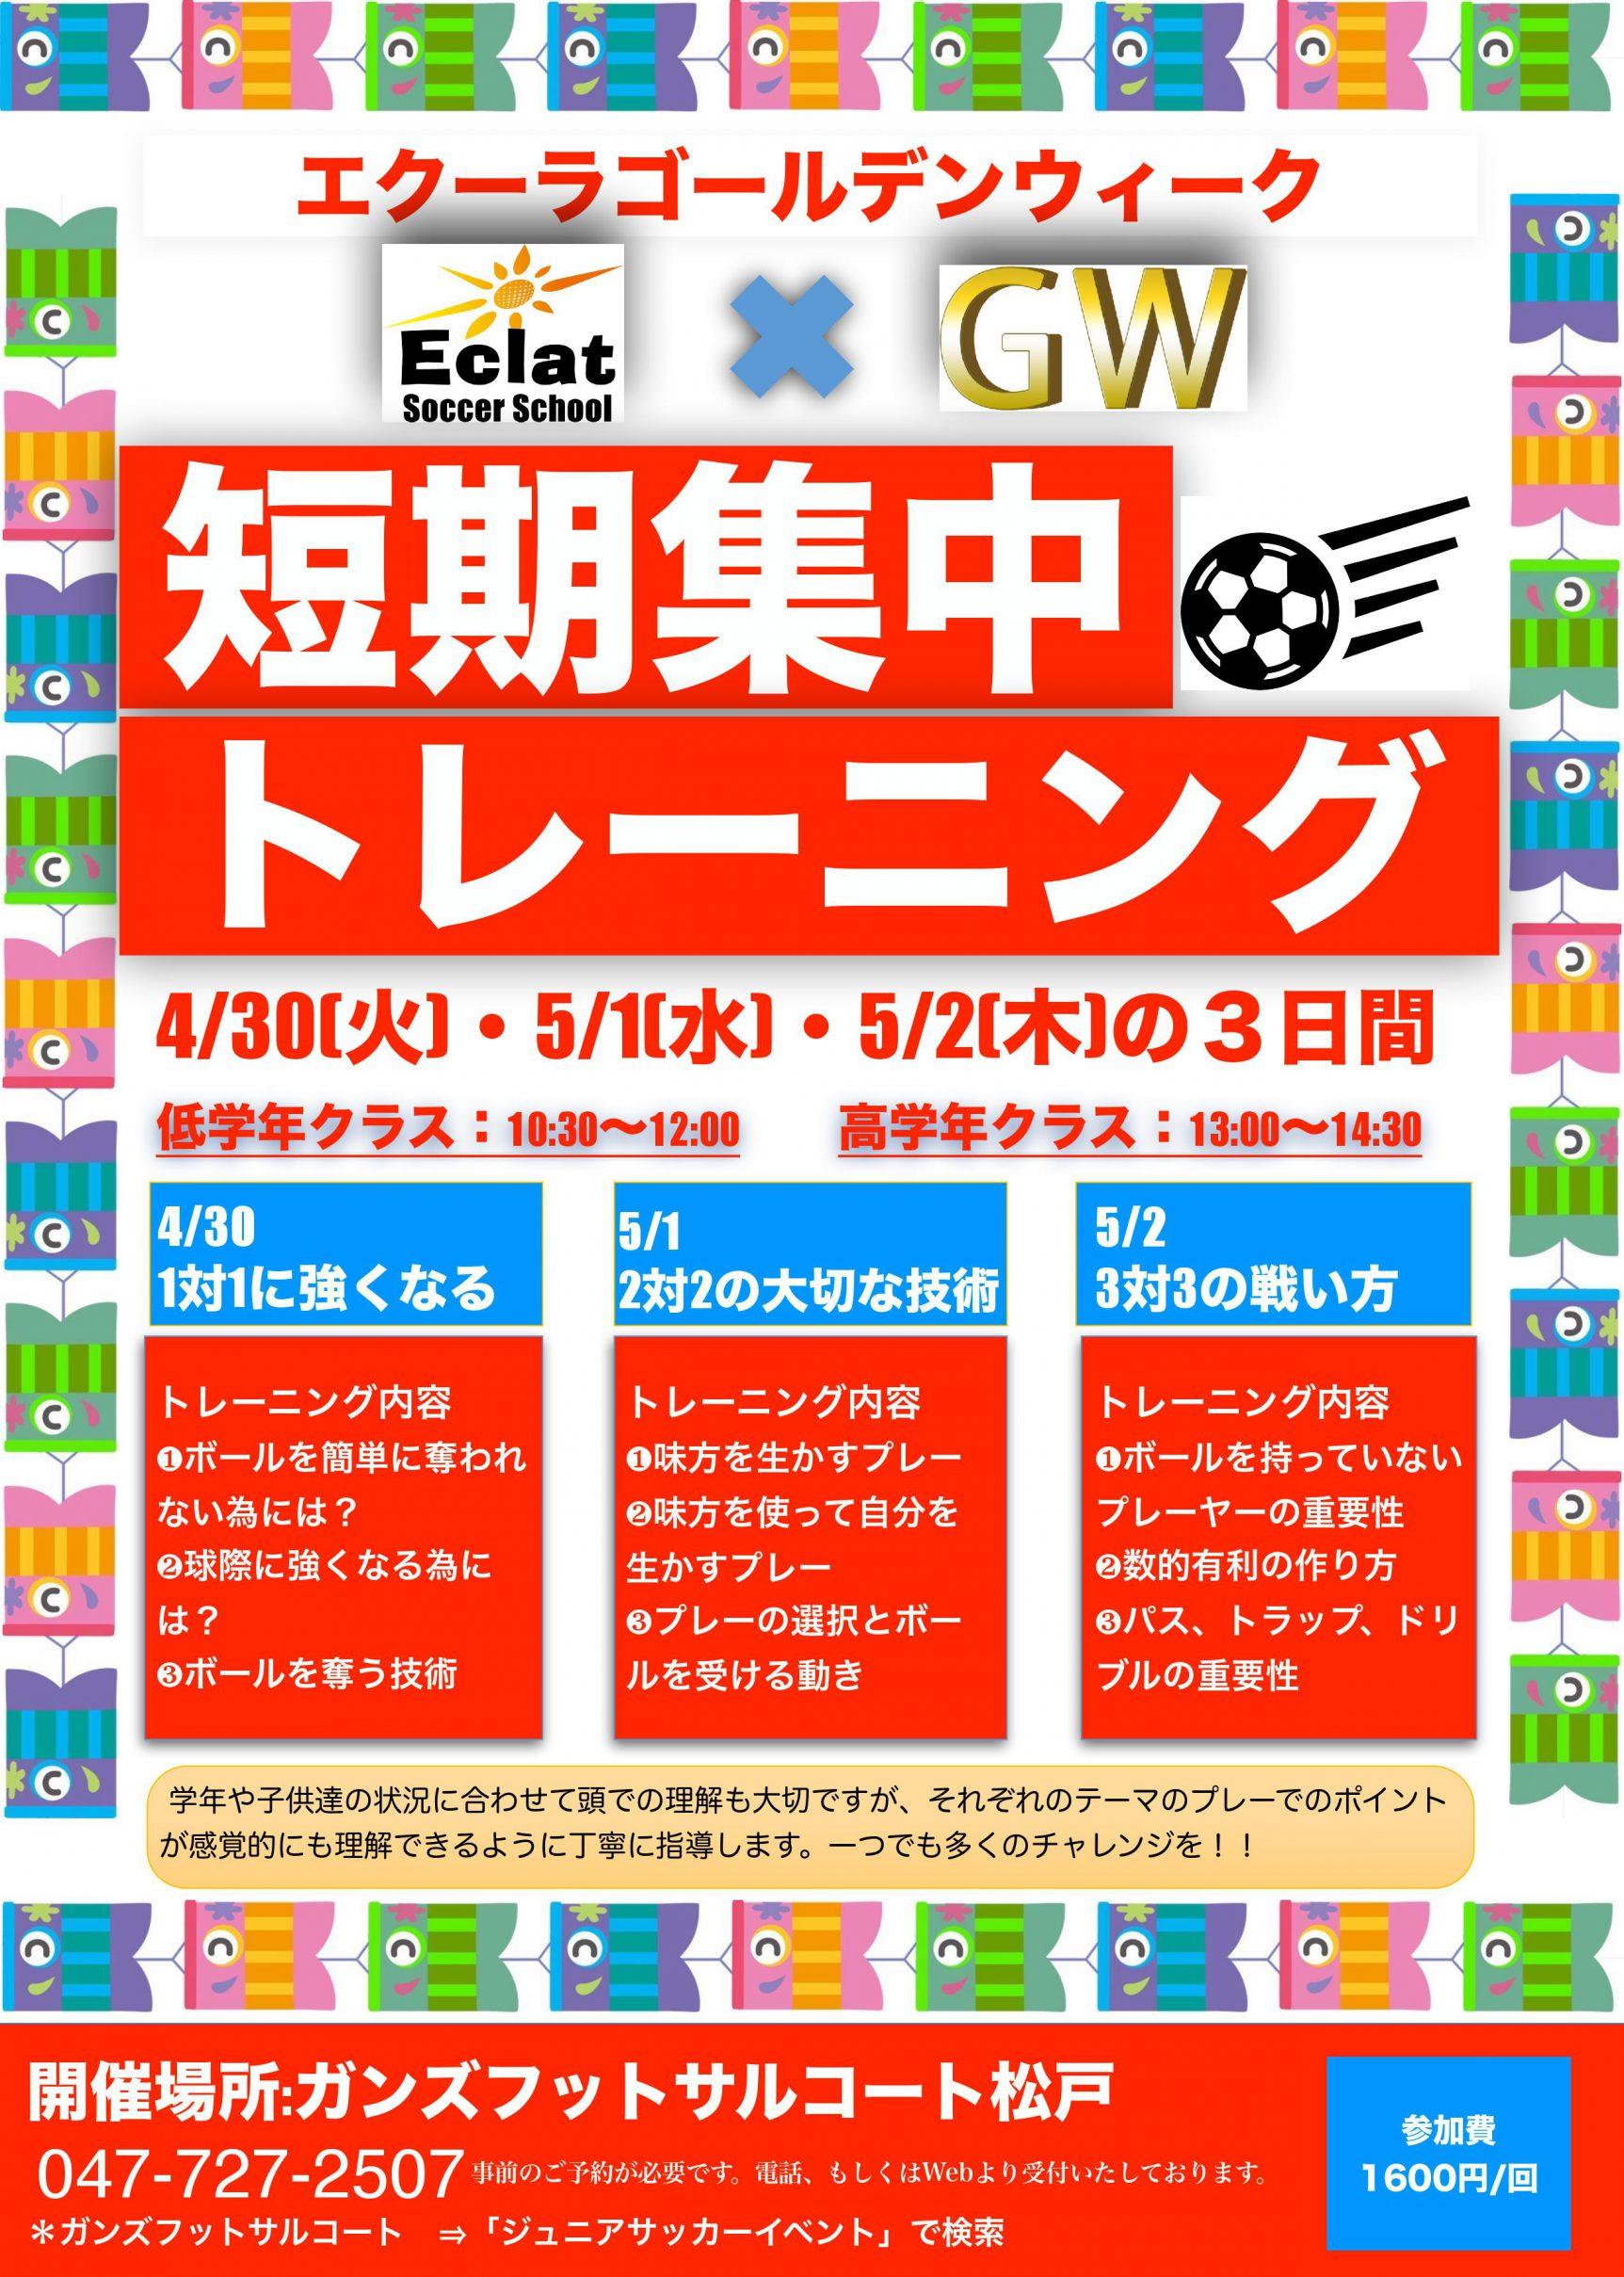 『GW企画第1弾』短期集中トレーニング4月30日(火)〜5月2日(木)